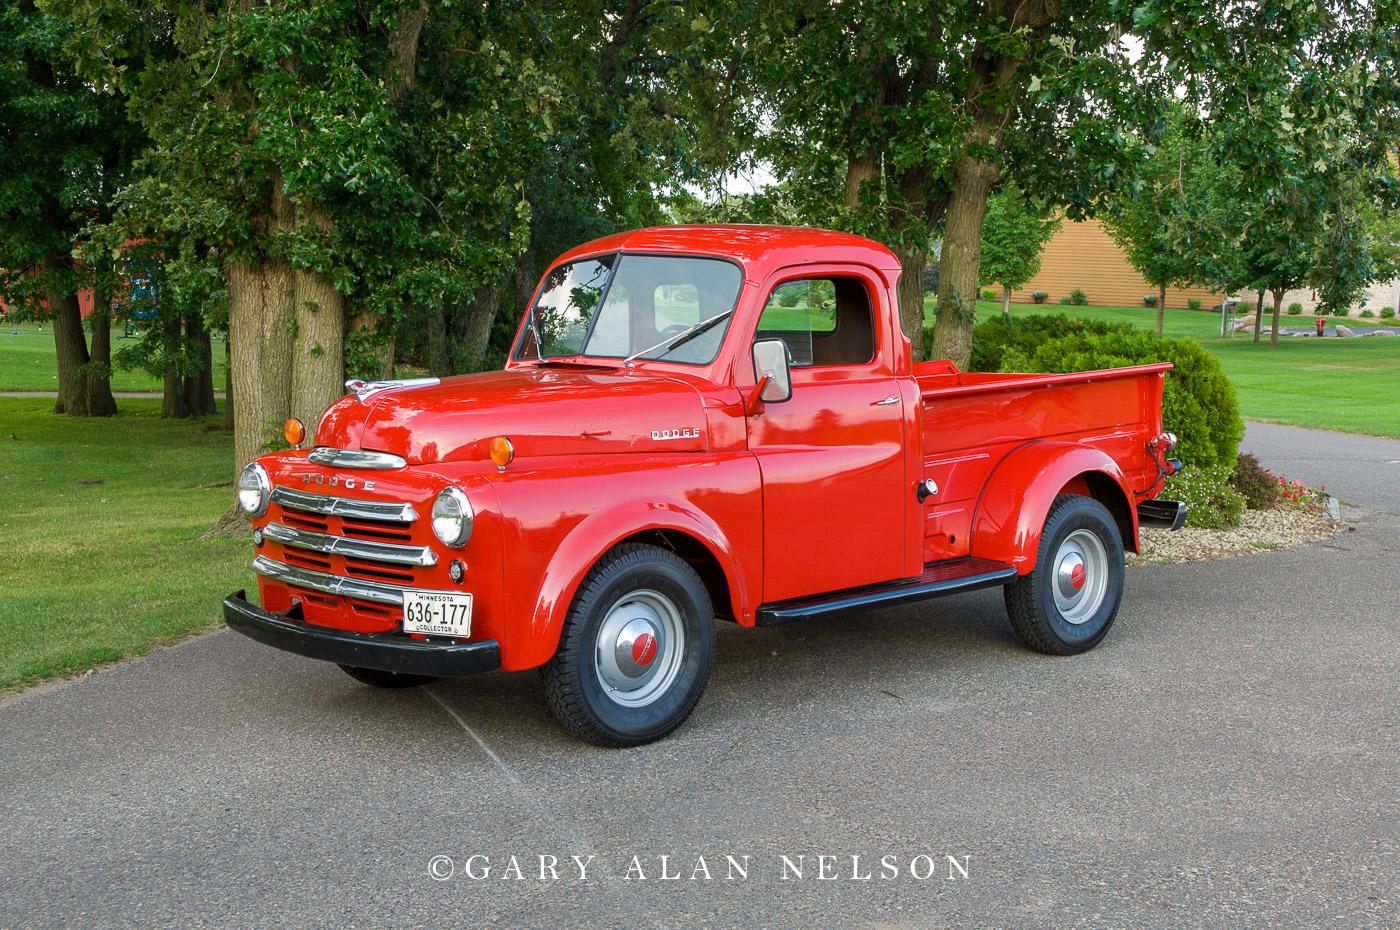 VT-07-77-DO 1949 Dodge B1B 1/2 ton pickup